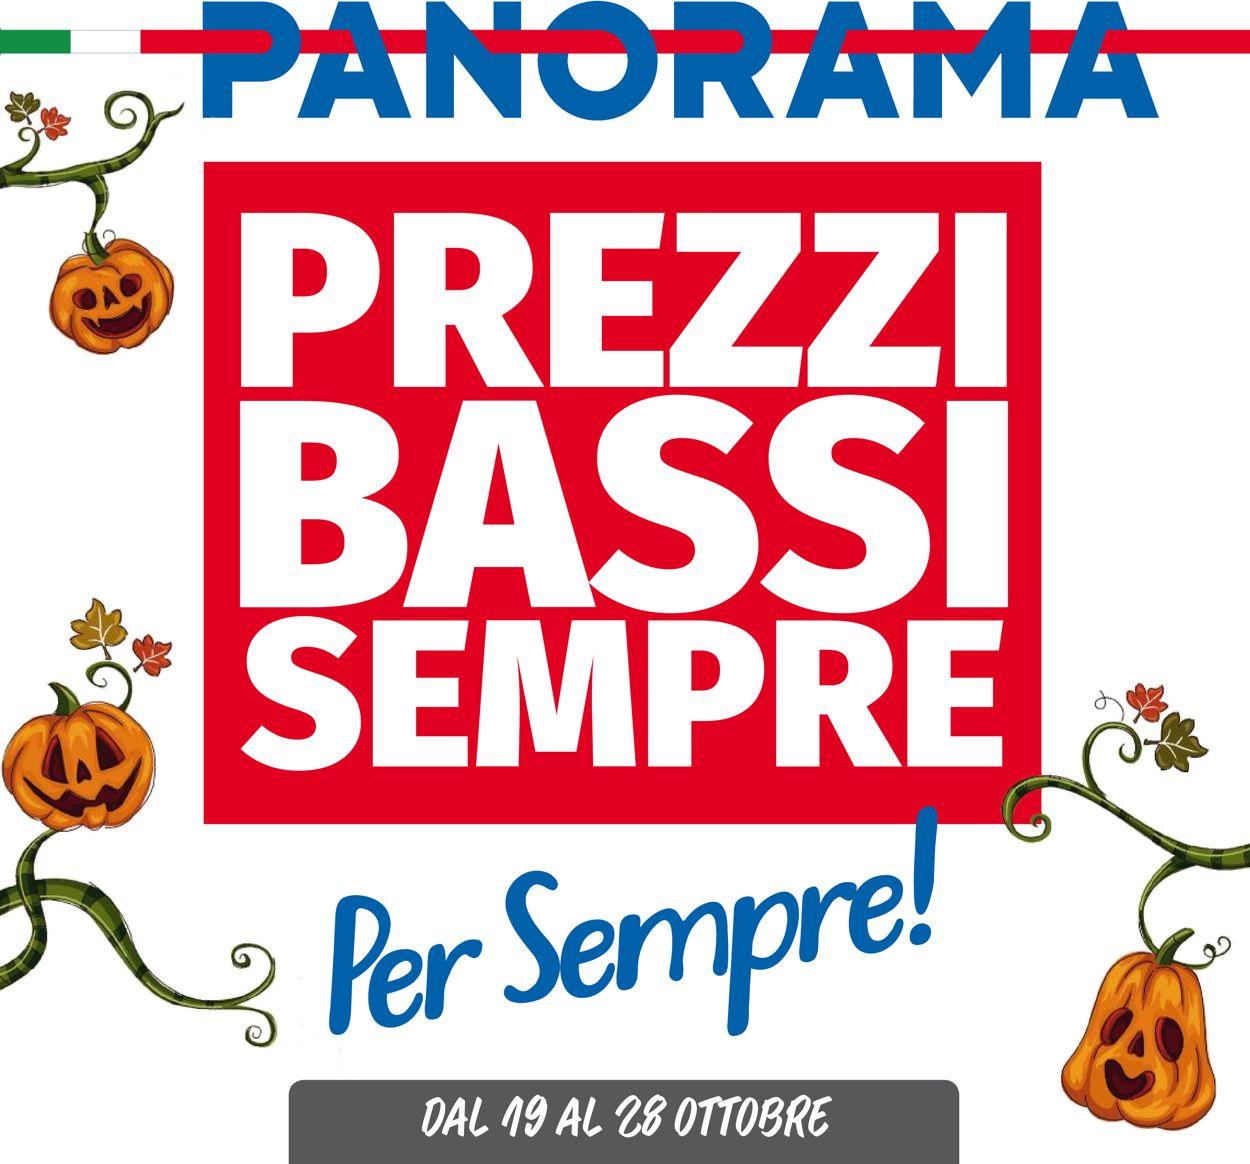 Volantino Pam Panorama - Offerte 19/10-28/10/2020